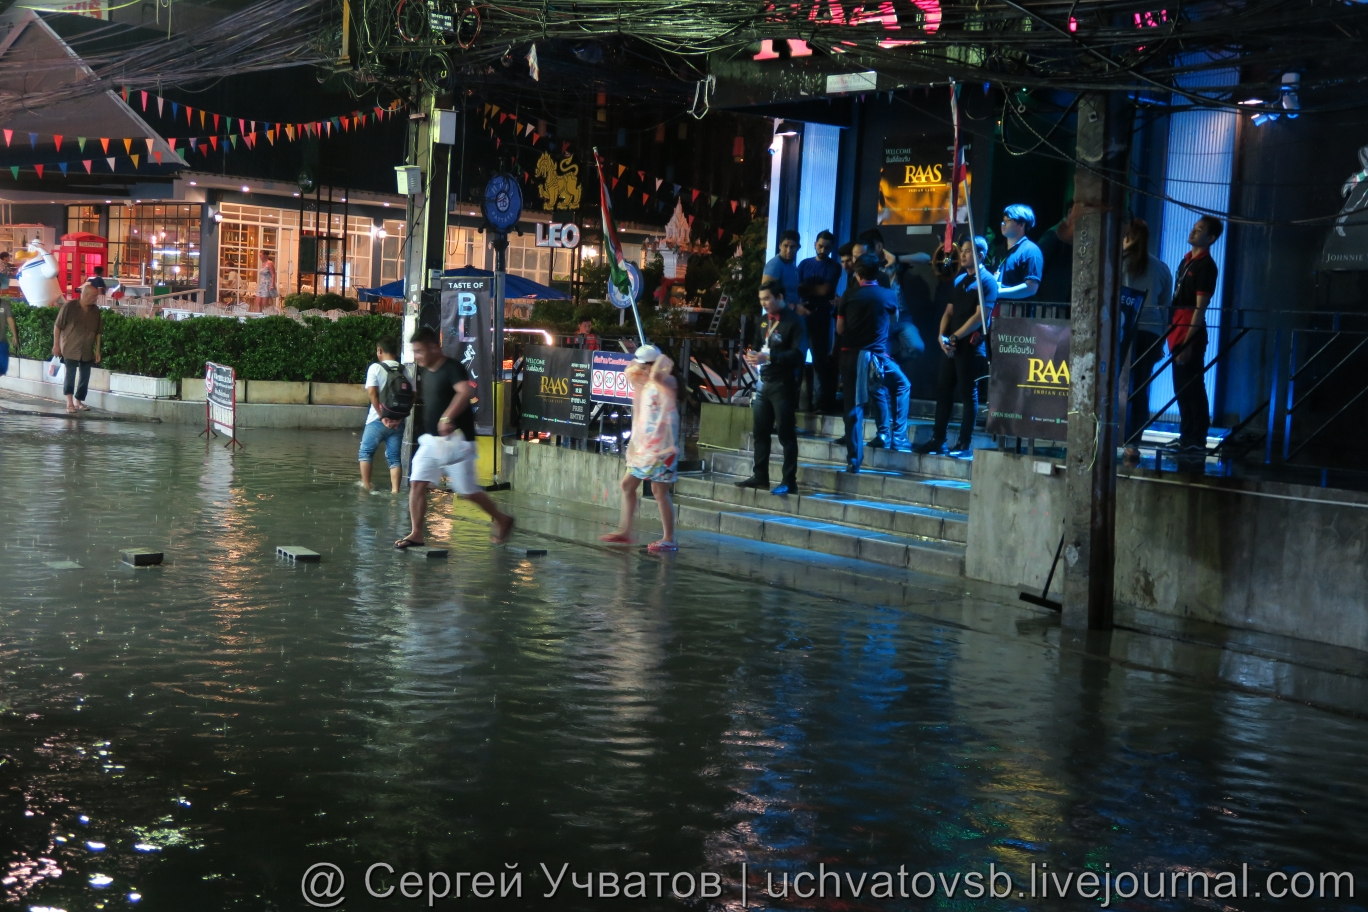 Walking Street в Таиланде (Паттайя) смыло дождем 2